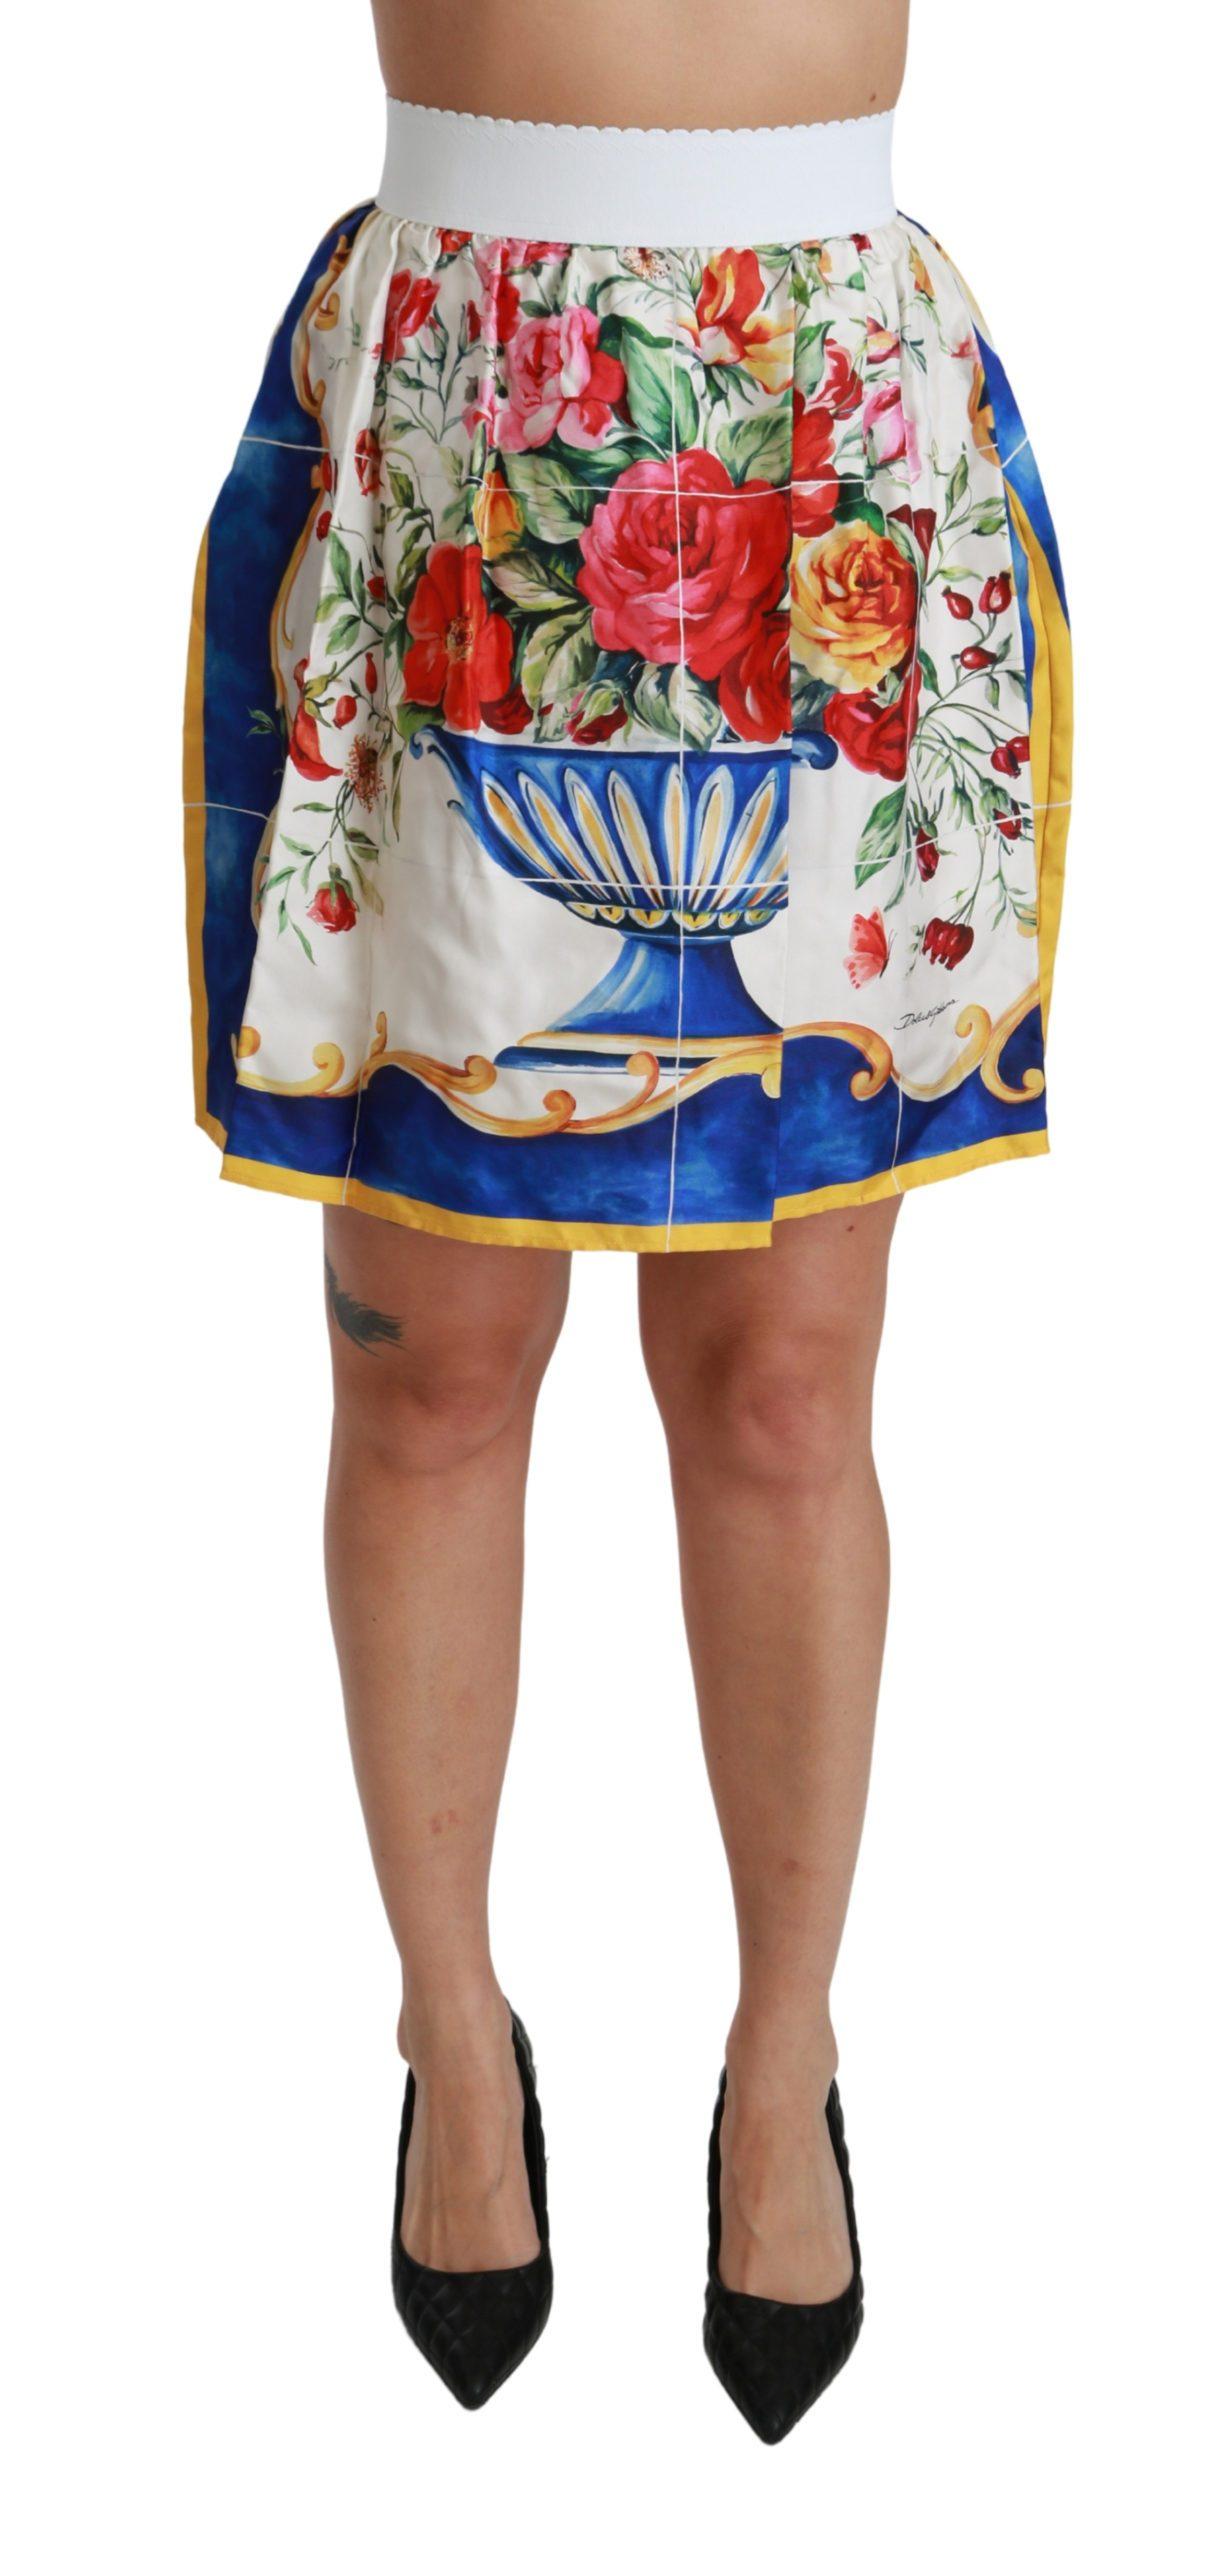 Dolce & Gabbana Women's Flower Vase High Waist Mini Skirt White SKI1409 - IT36 | XS